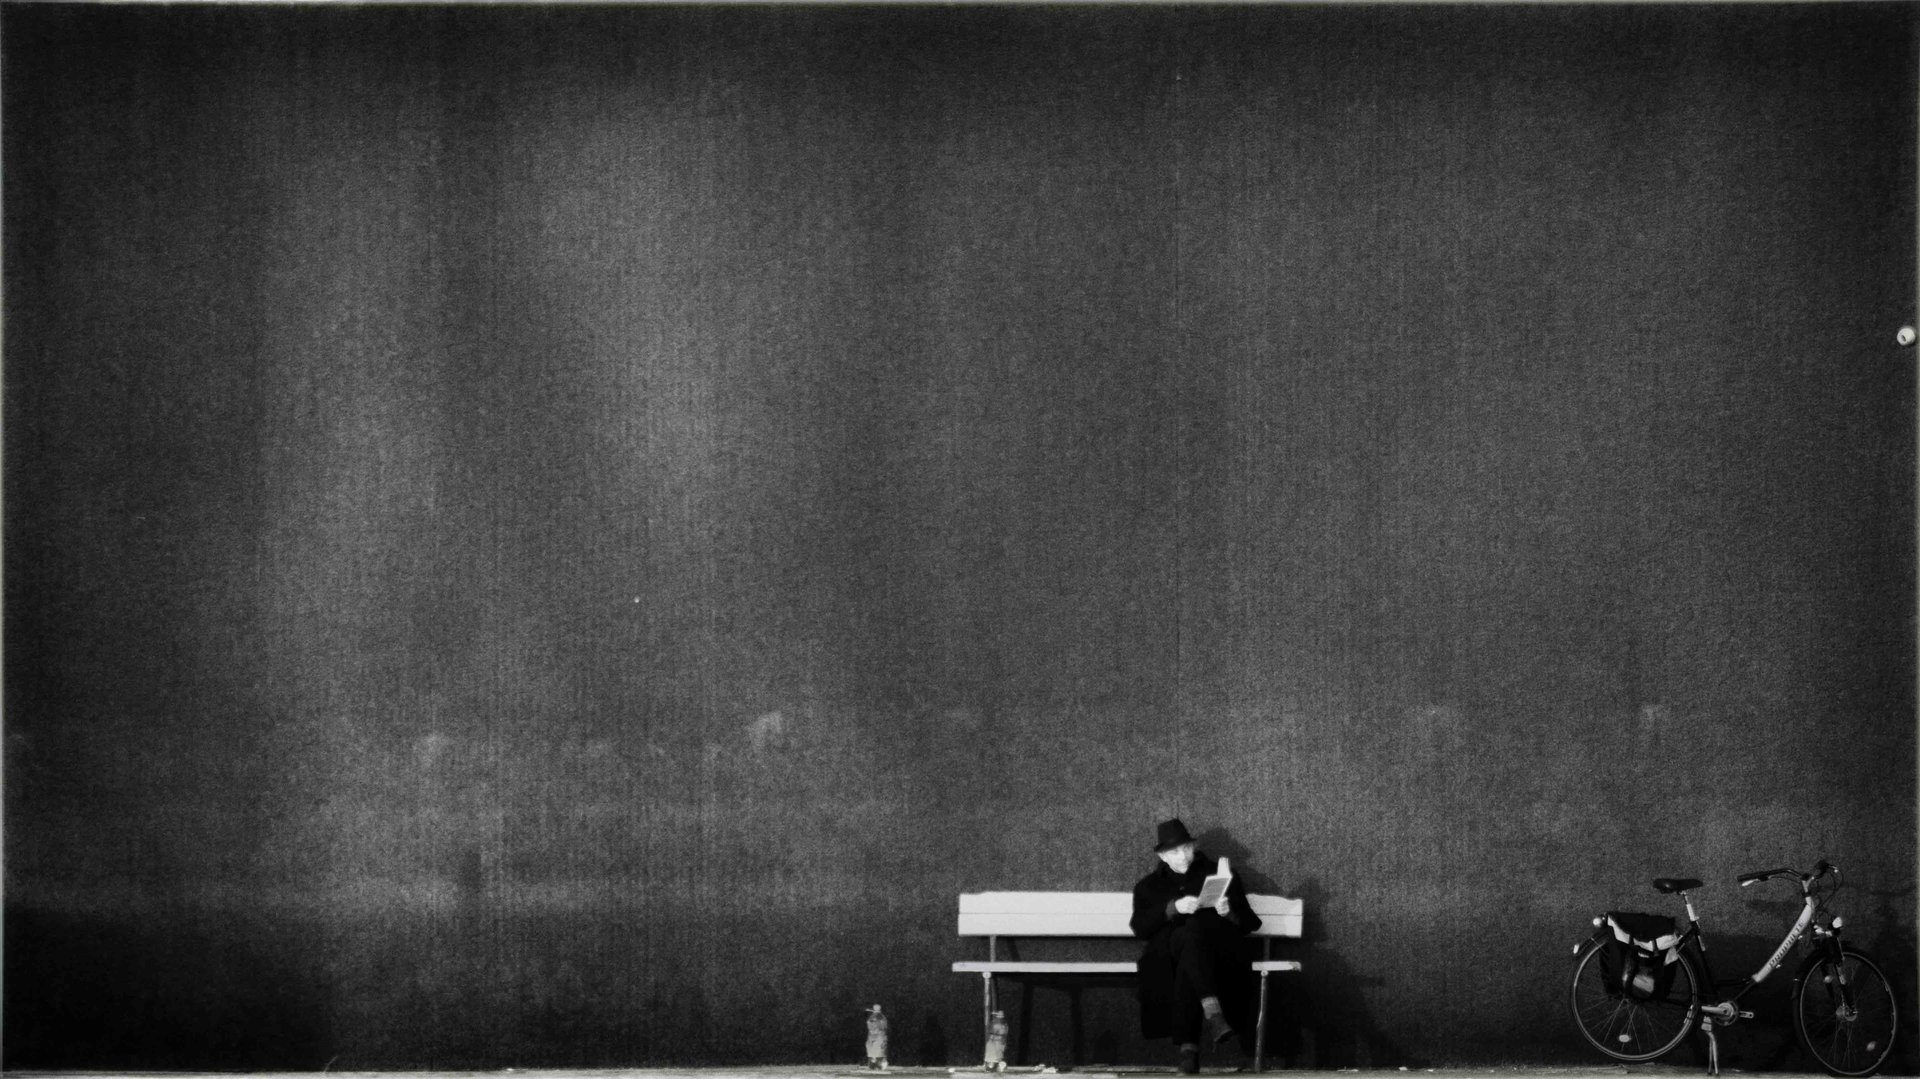 без лице | Author Stefan Stefanov - chopa | PHOTO FORUM